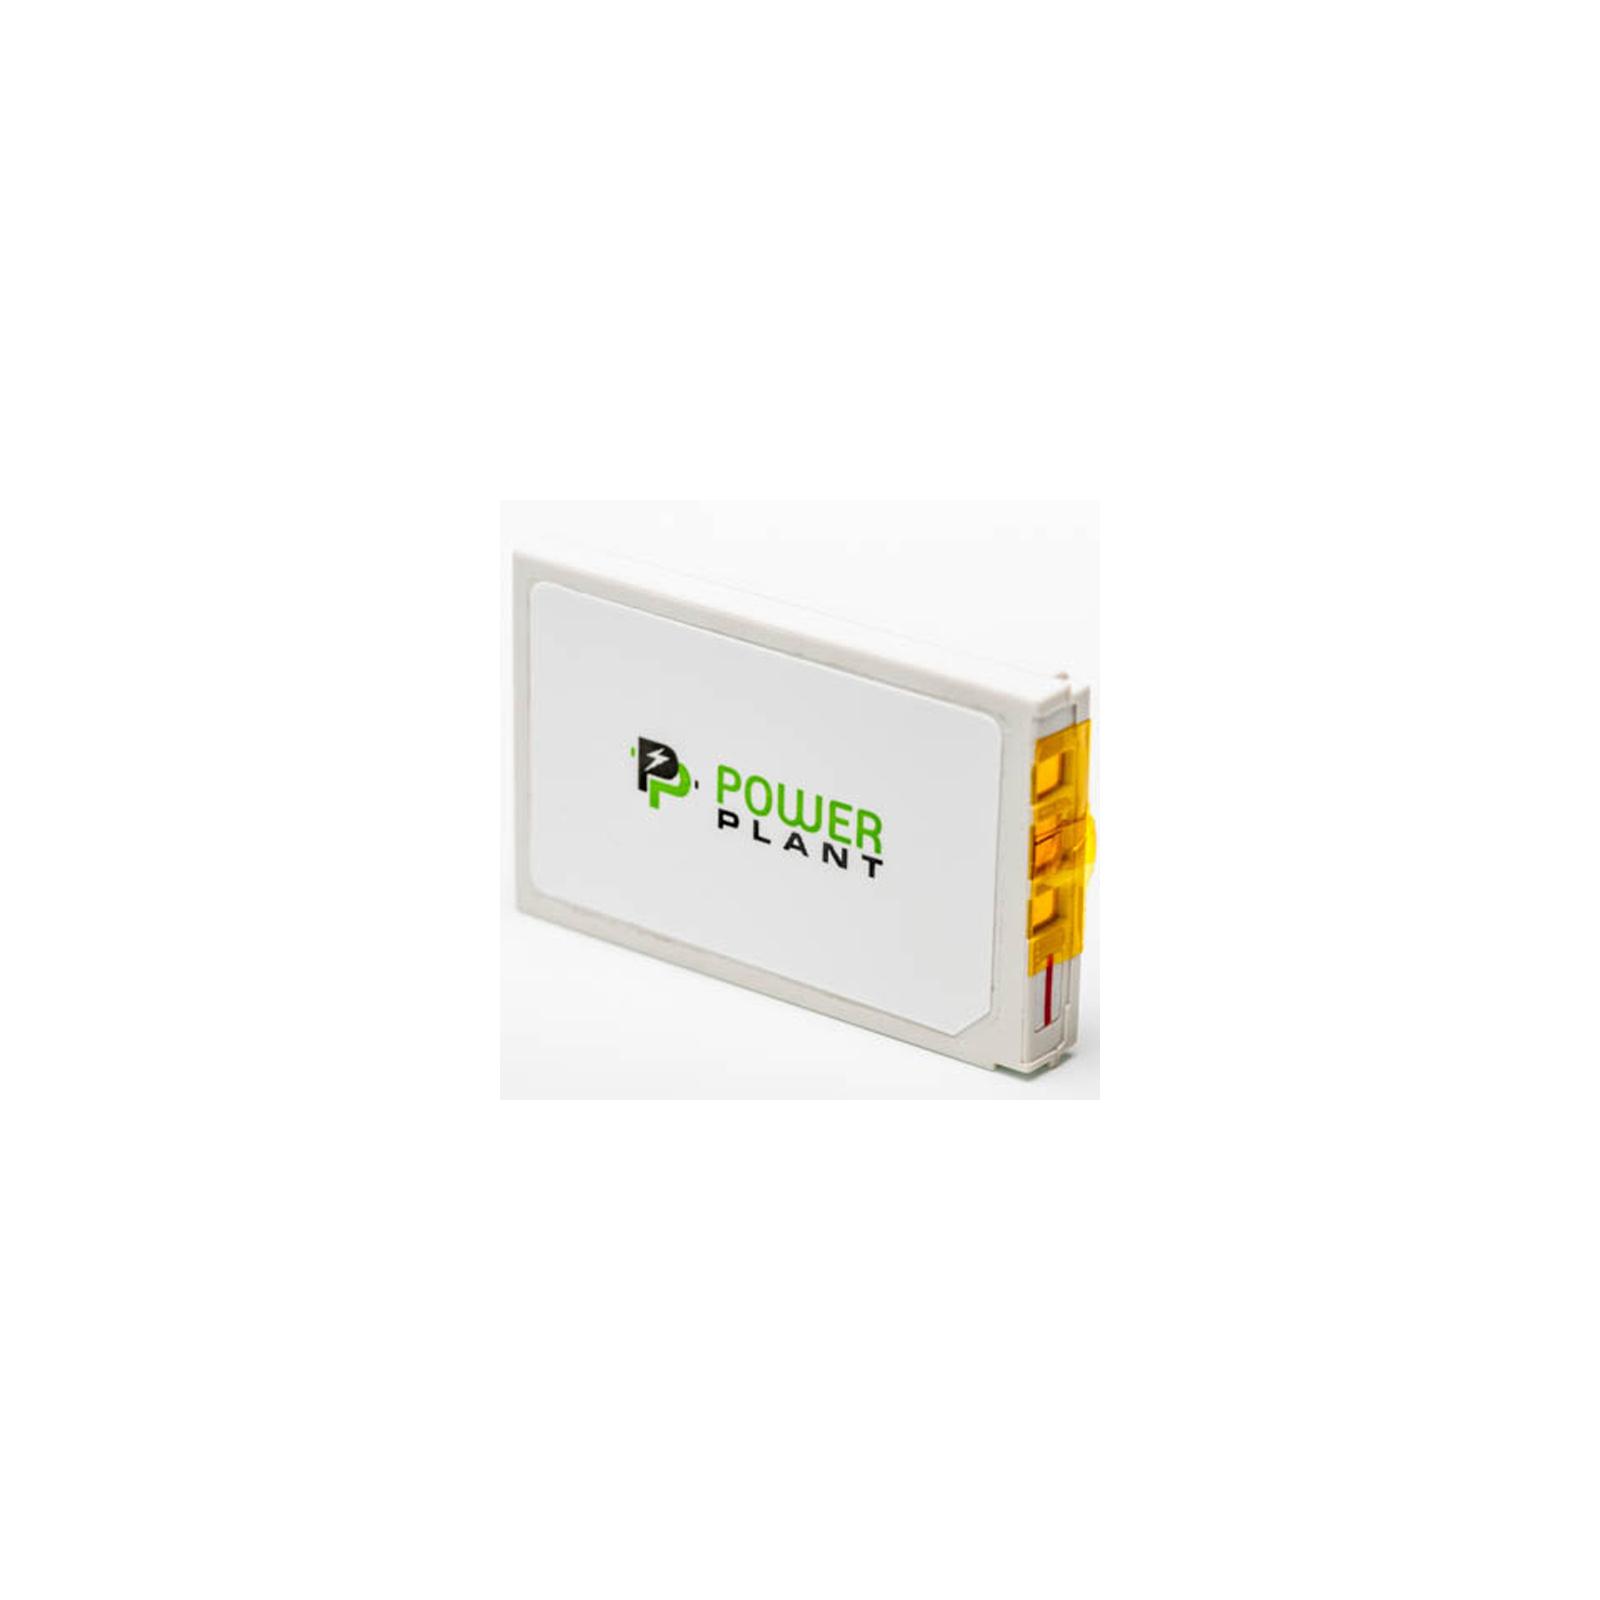 Аккумуляторная батарея PowerPlant Nokia BLB-2 (8210, 8850, 8910) (DV00DV1126) изображение 2